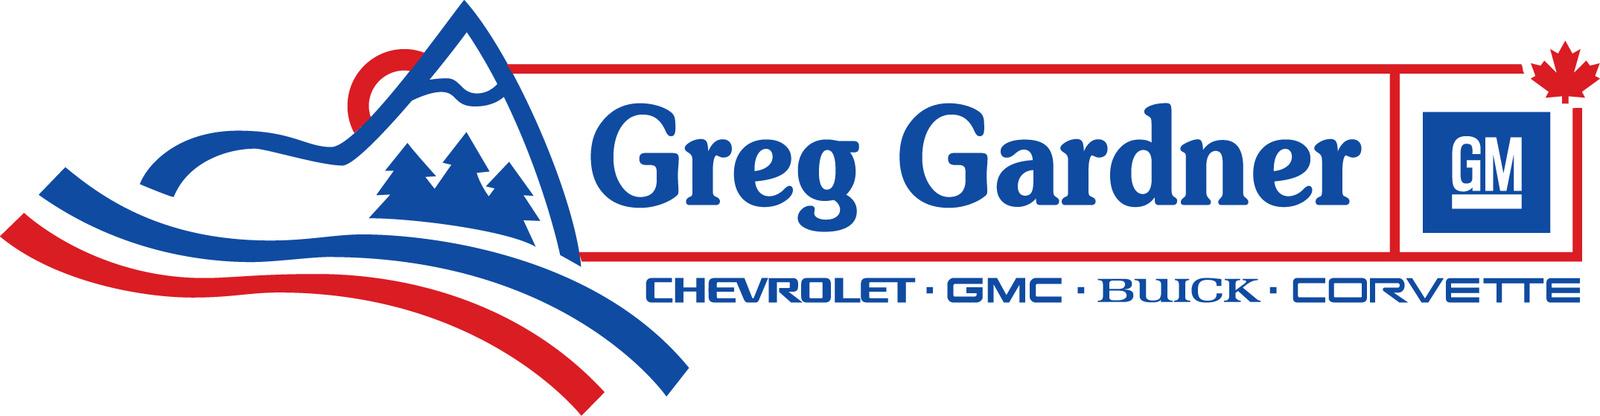 Greg Gardner Used Cars